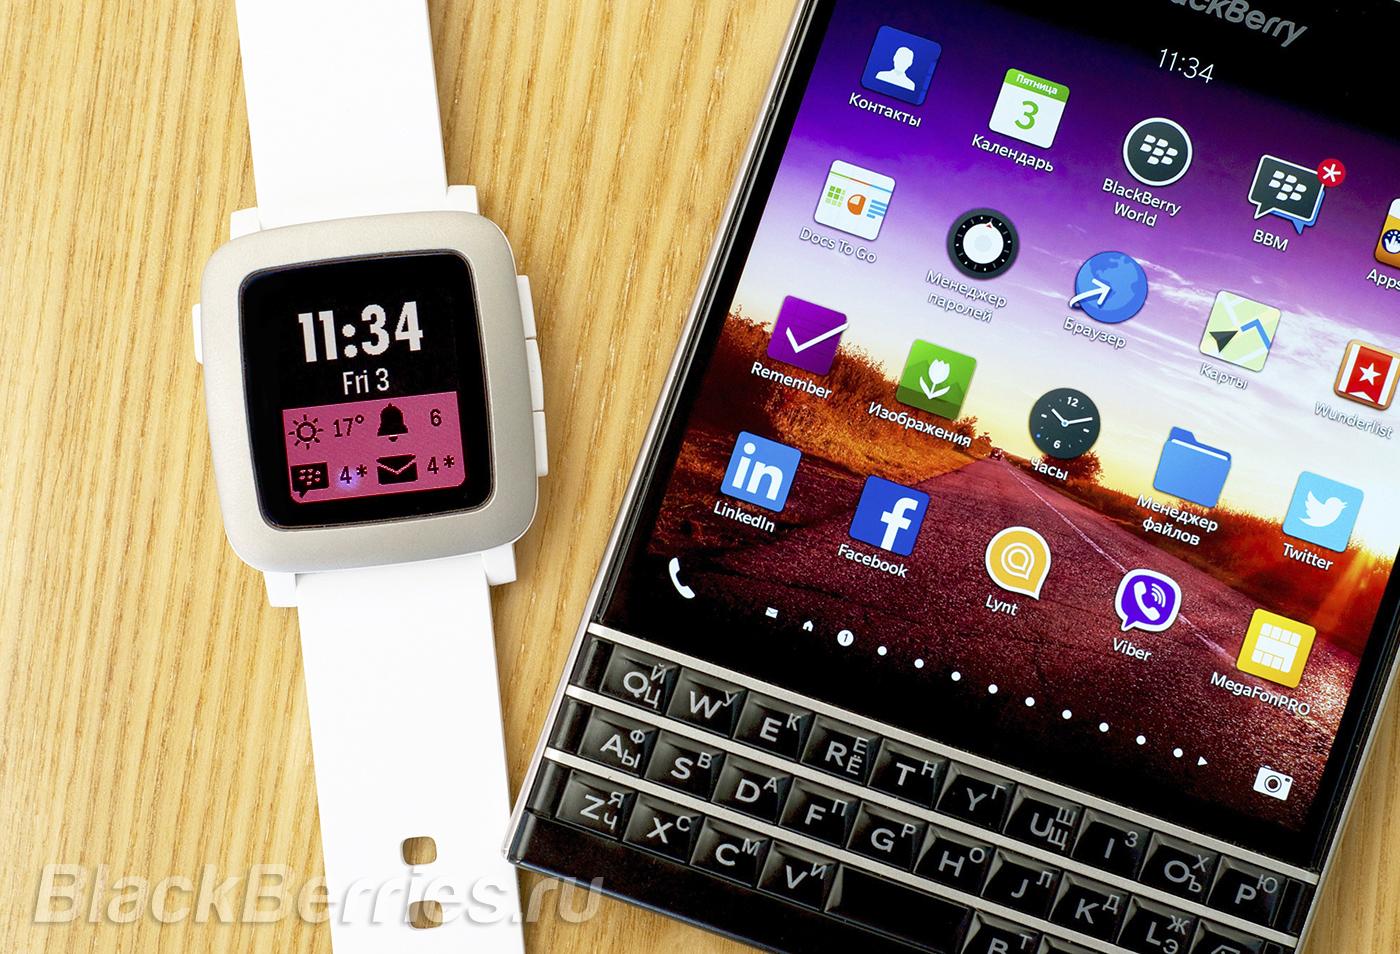 BlackBerry-Passport-Pebble-Time-54